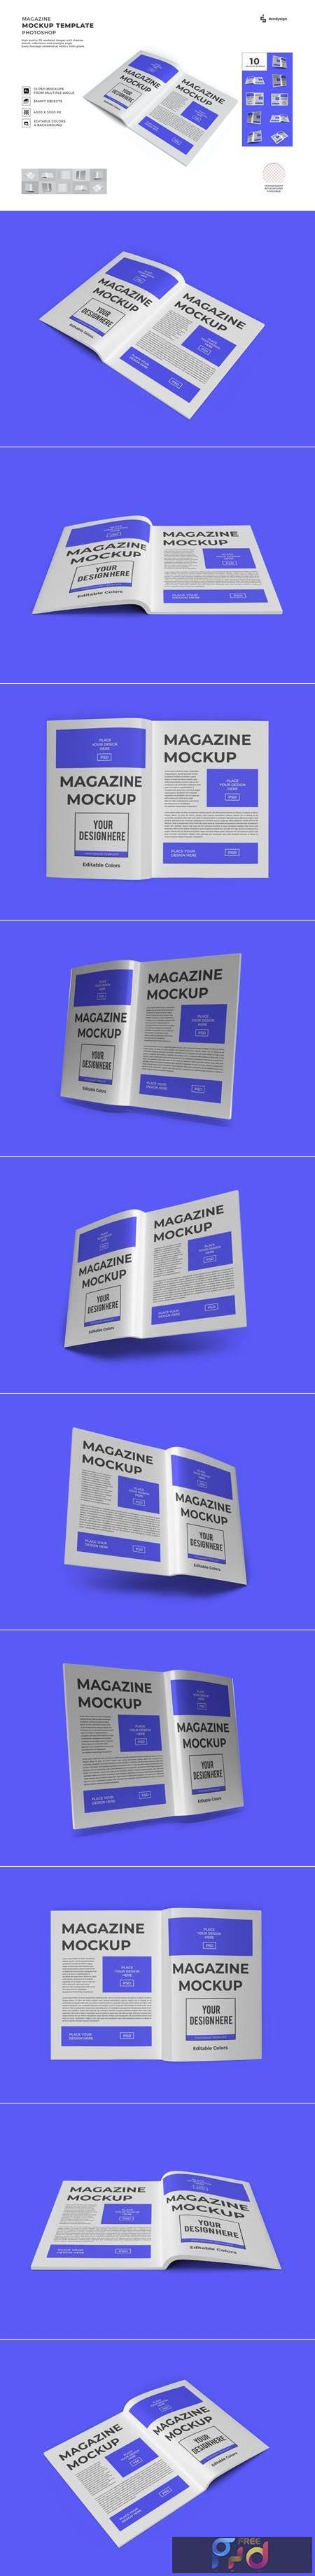 Magazine Paper Mockup Template Set 4BHPN9W 1